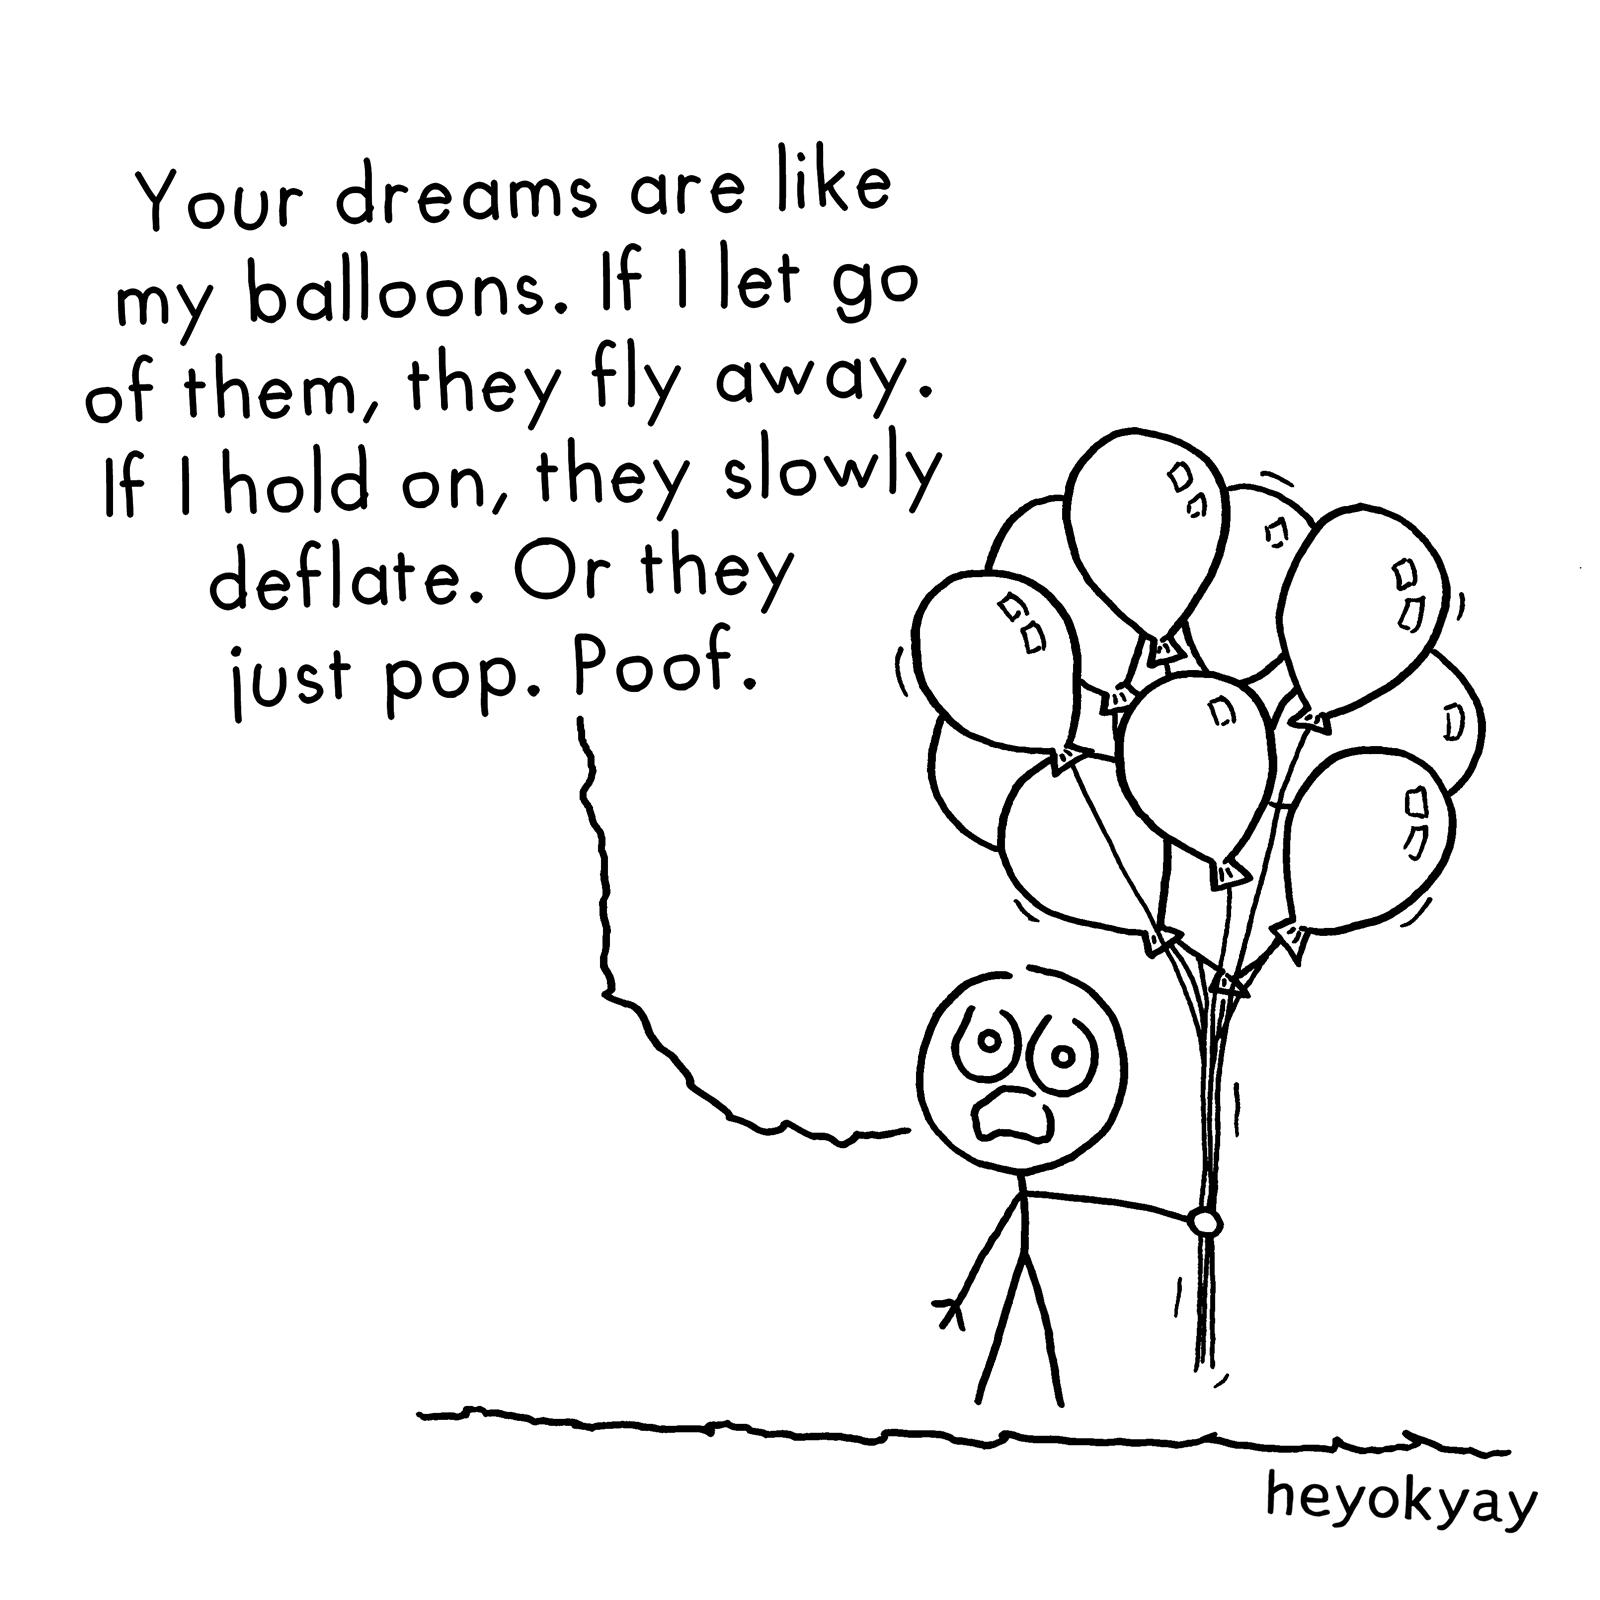 Balloons heyokyay comic